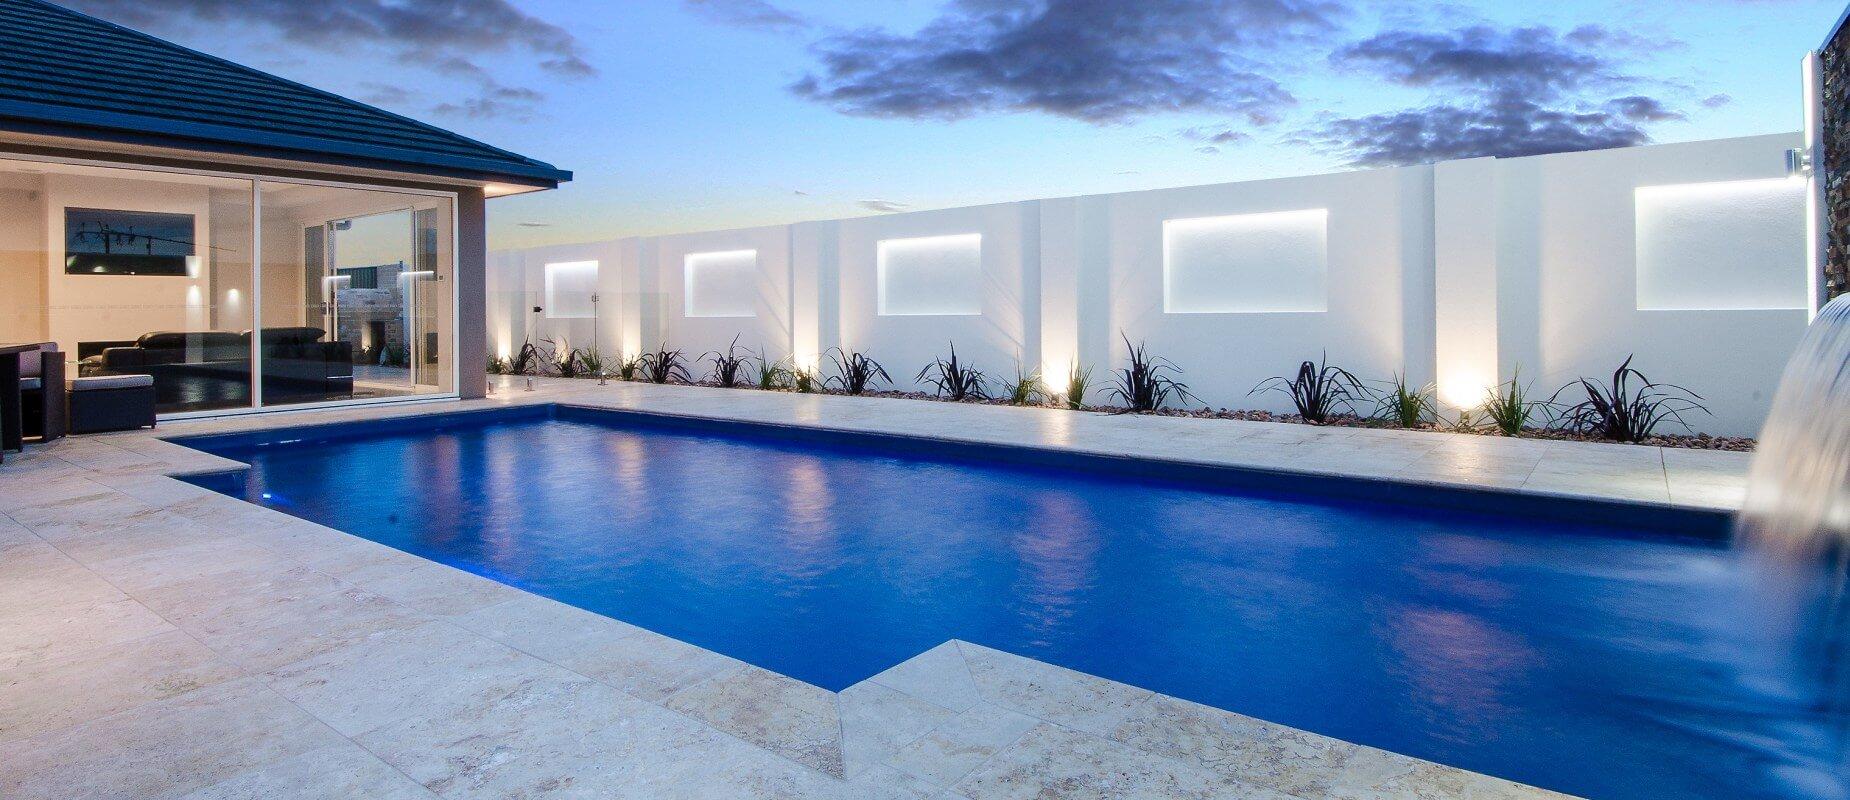 piscina de lux modele frumoase 9